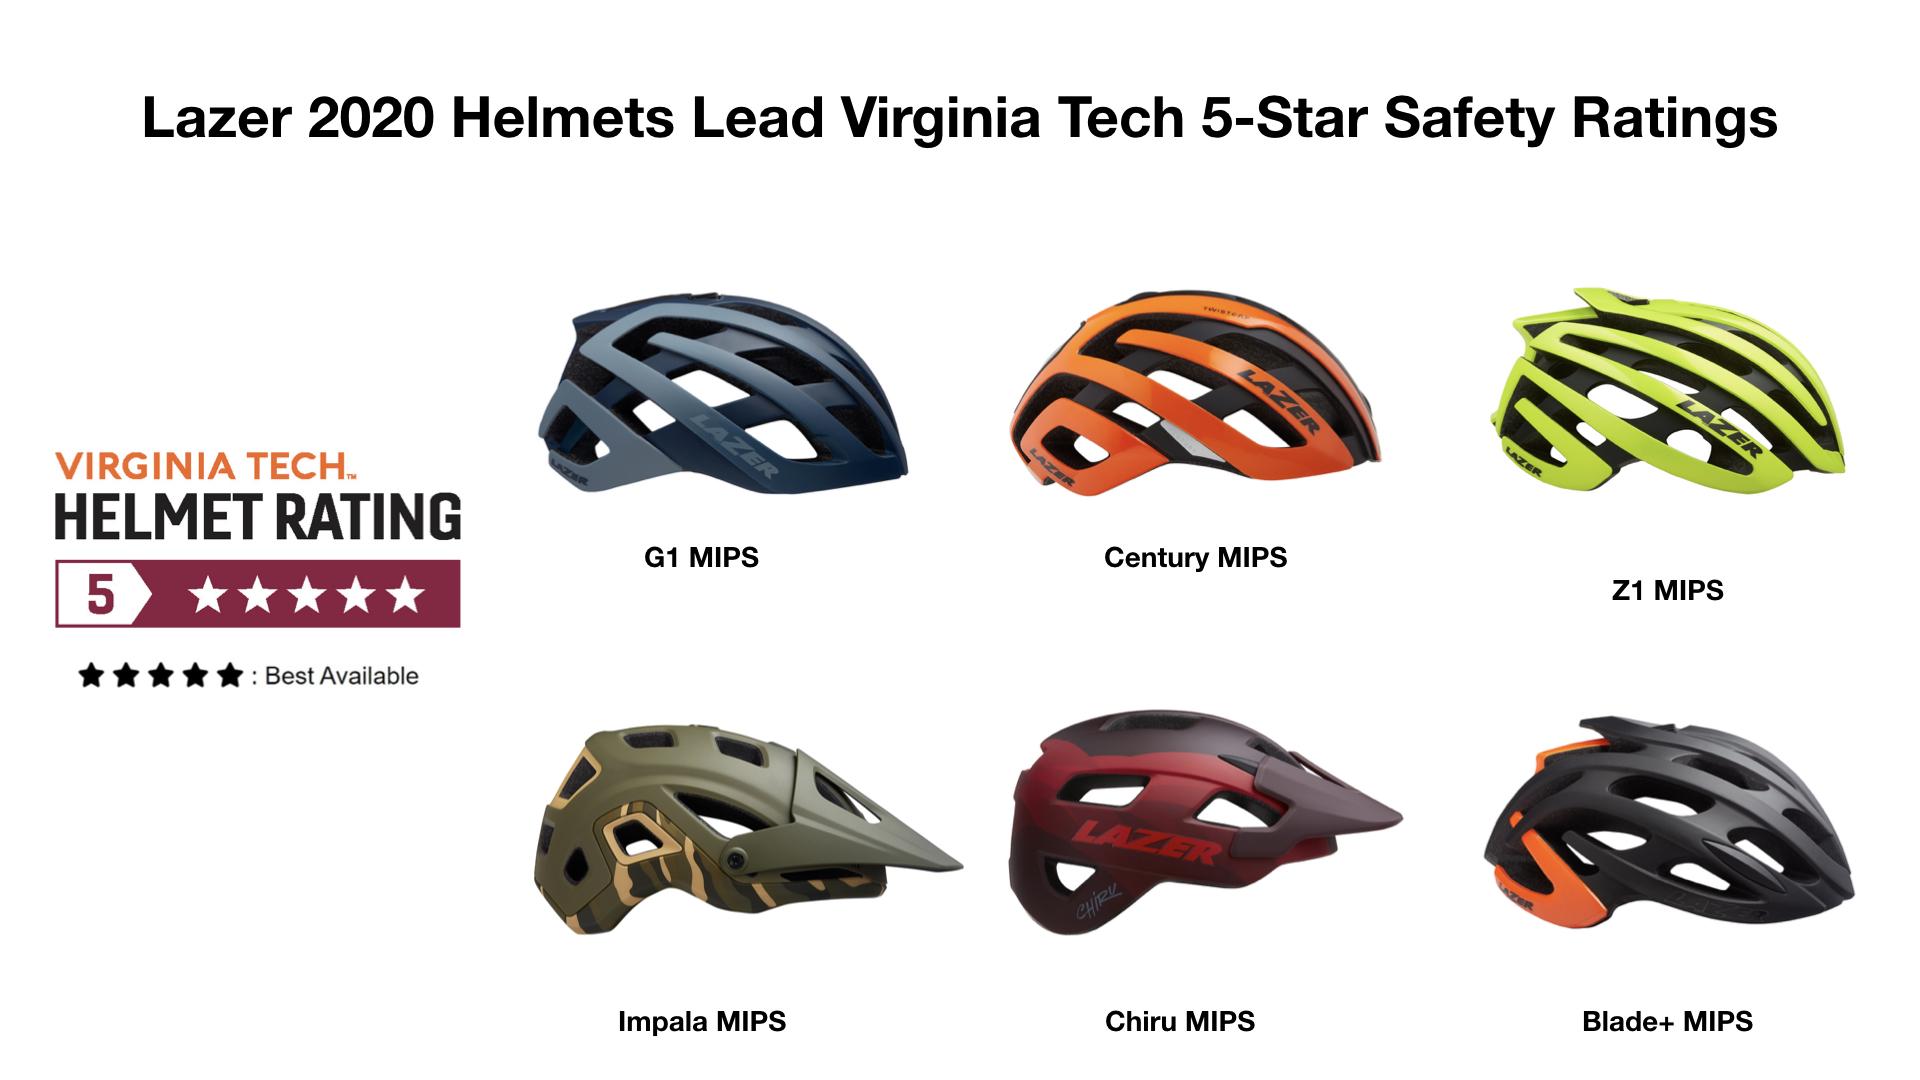 Lazer Helmets Dominate 5 Star Ratings According To Virginia Tech